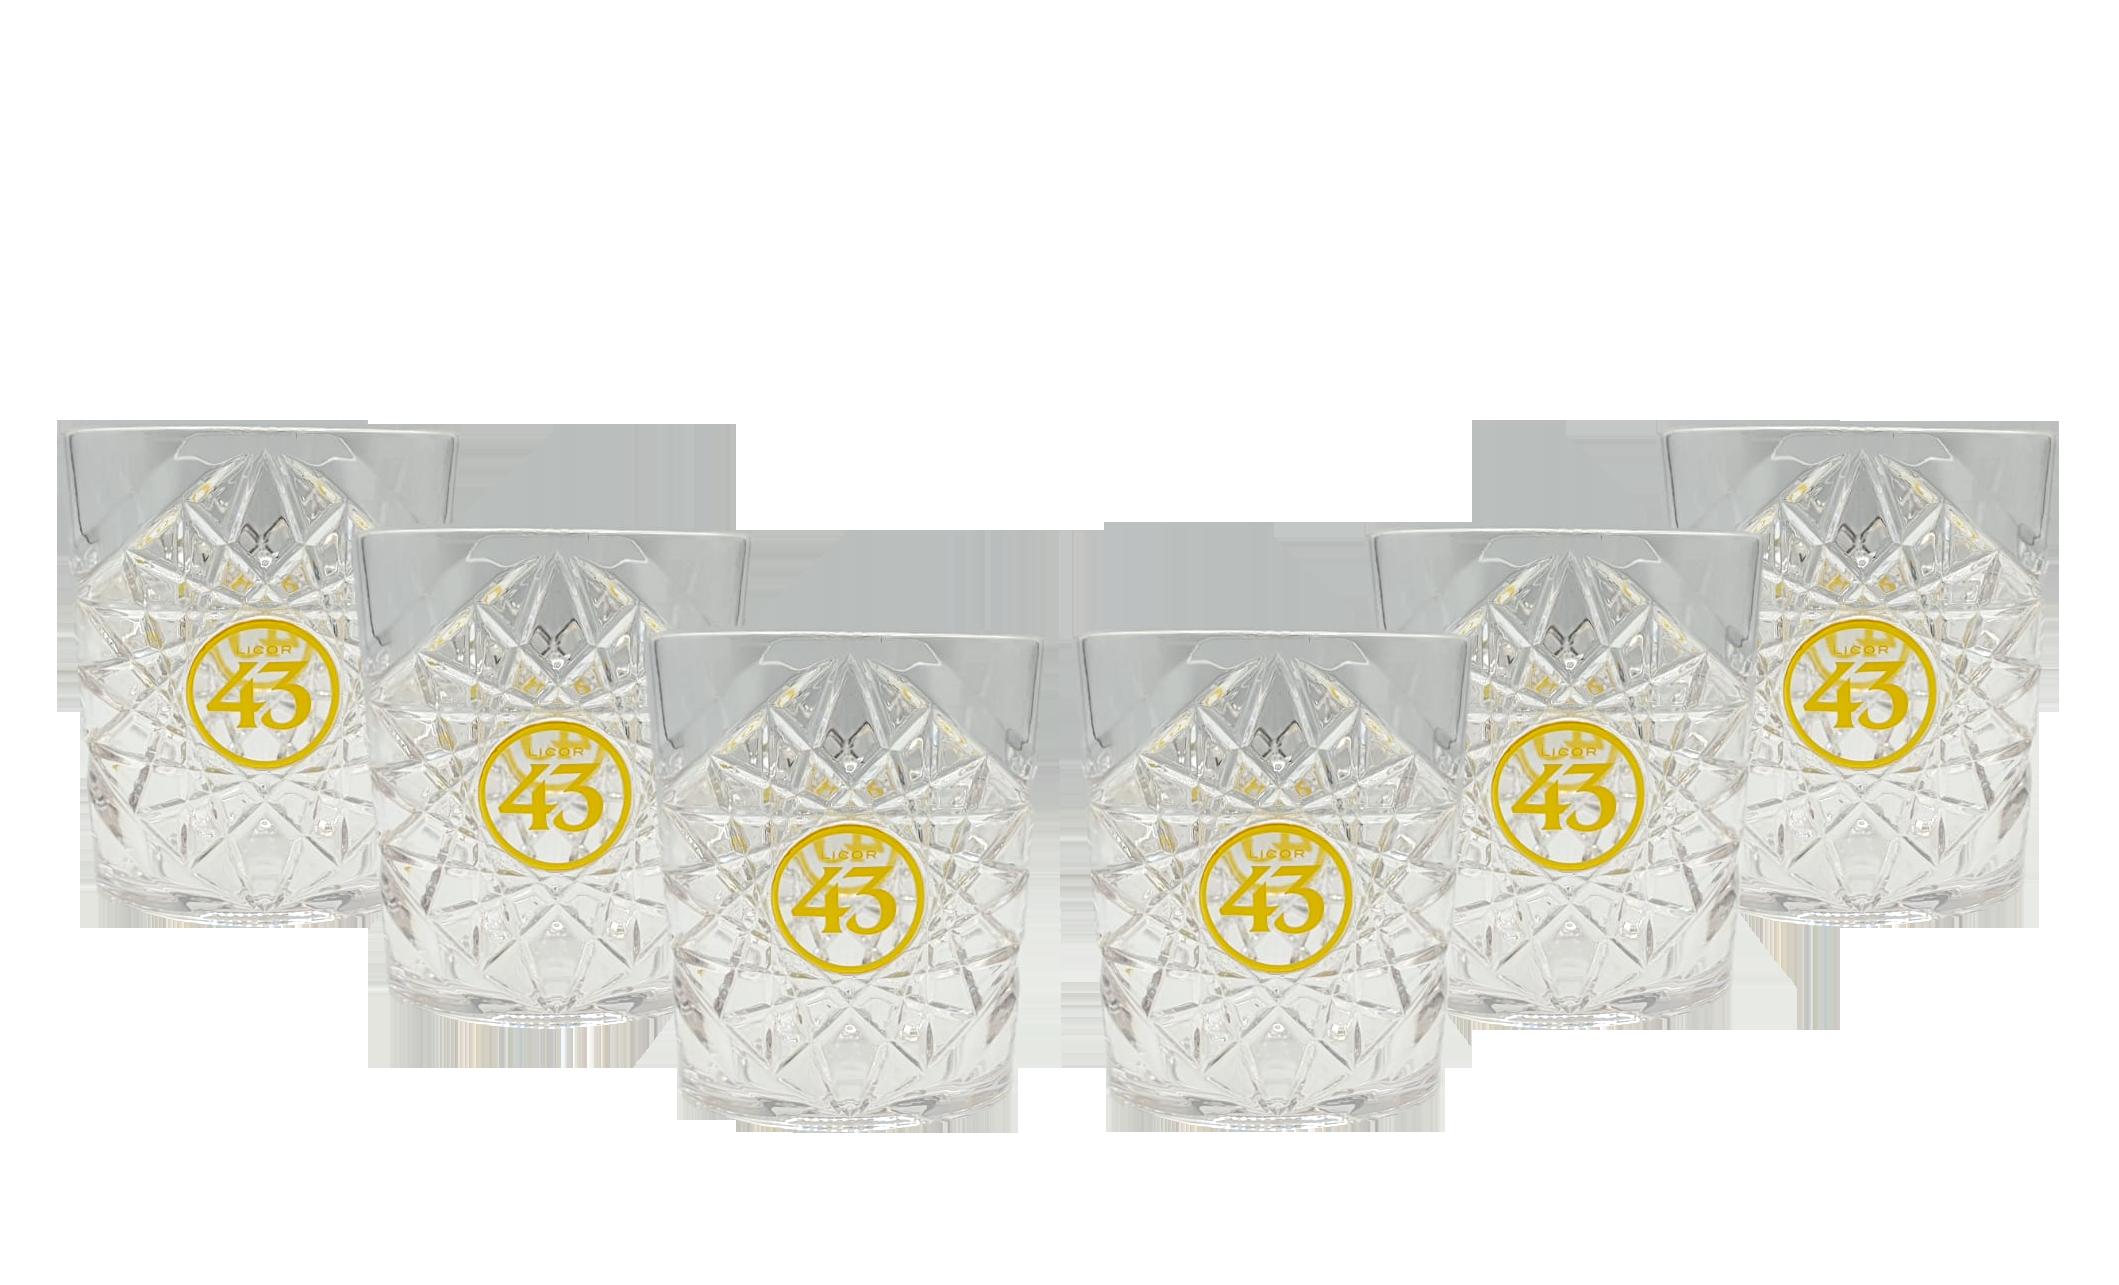 Licor 43 Tumbler 6er Set Gläser aus Acryl Kristallmuster mit Logo Likör Liquor 43er